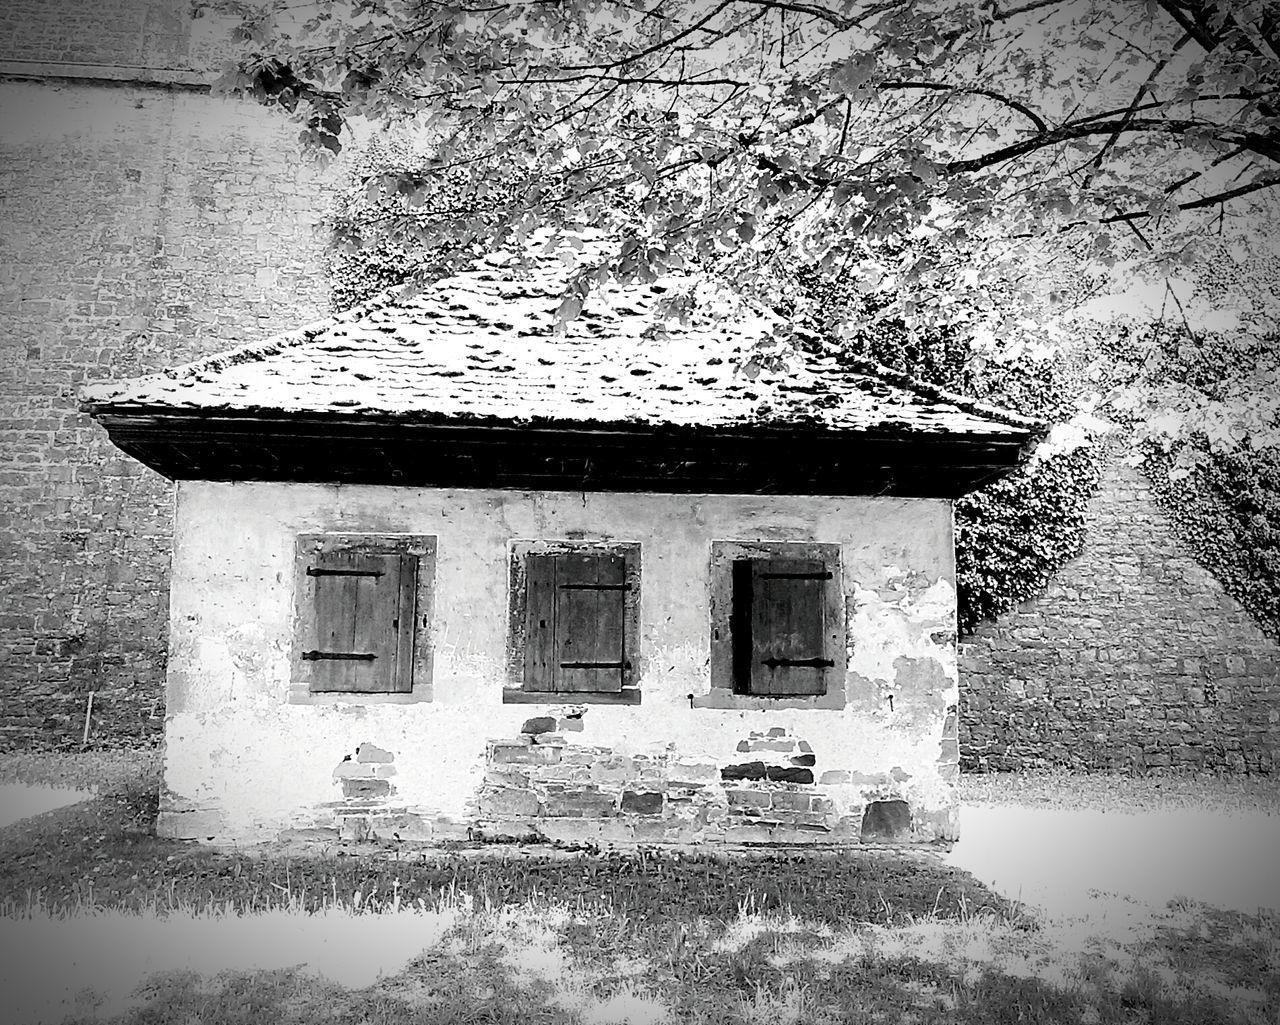 Festung Marienberg Wuerzburg Würzburg Bavaria Bayern Franken Blackandwhite Black & White Blackandwhite Photography Shades Of Grey